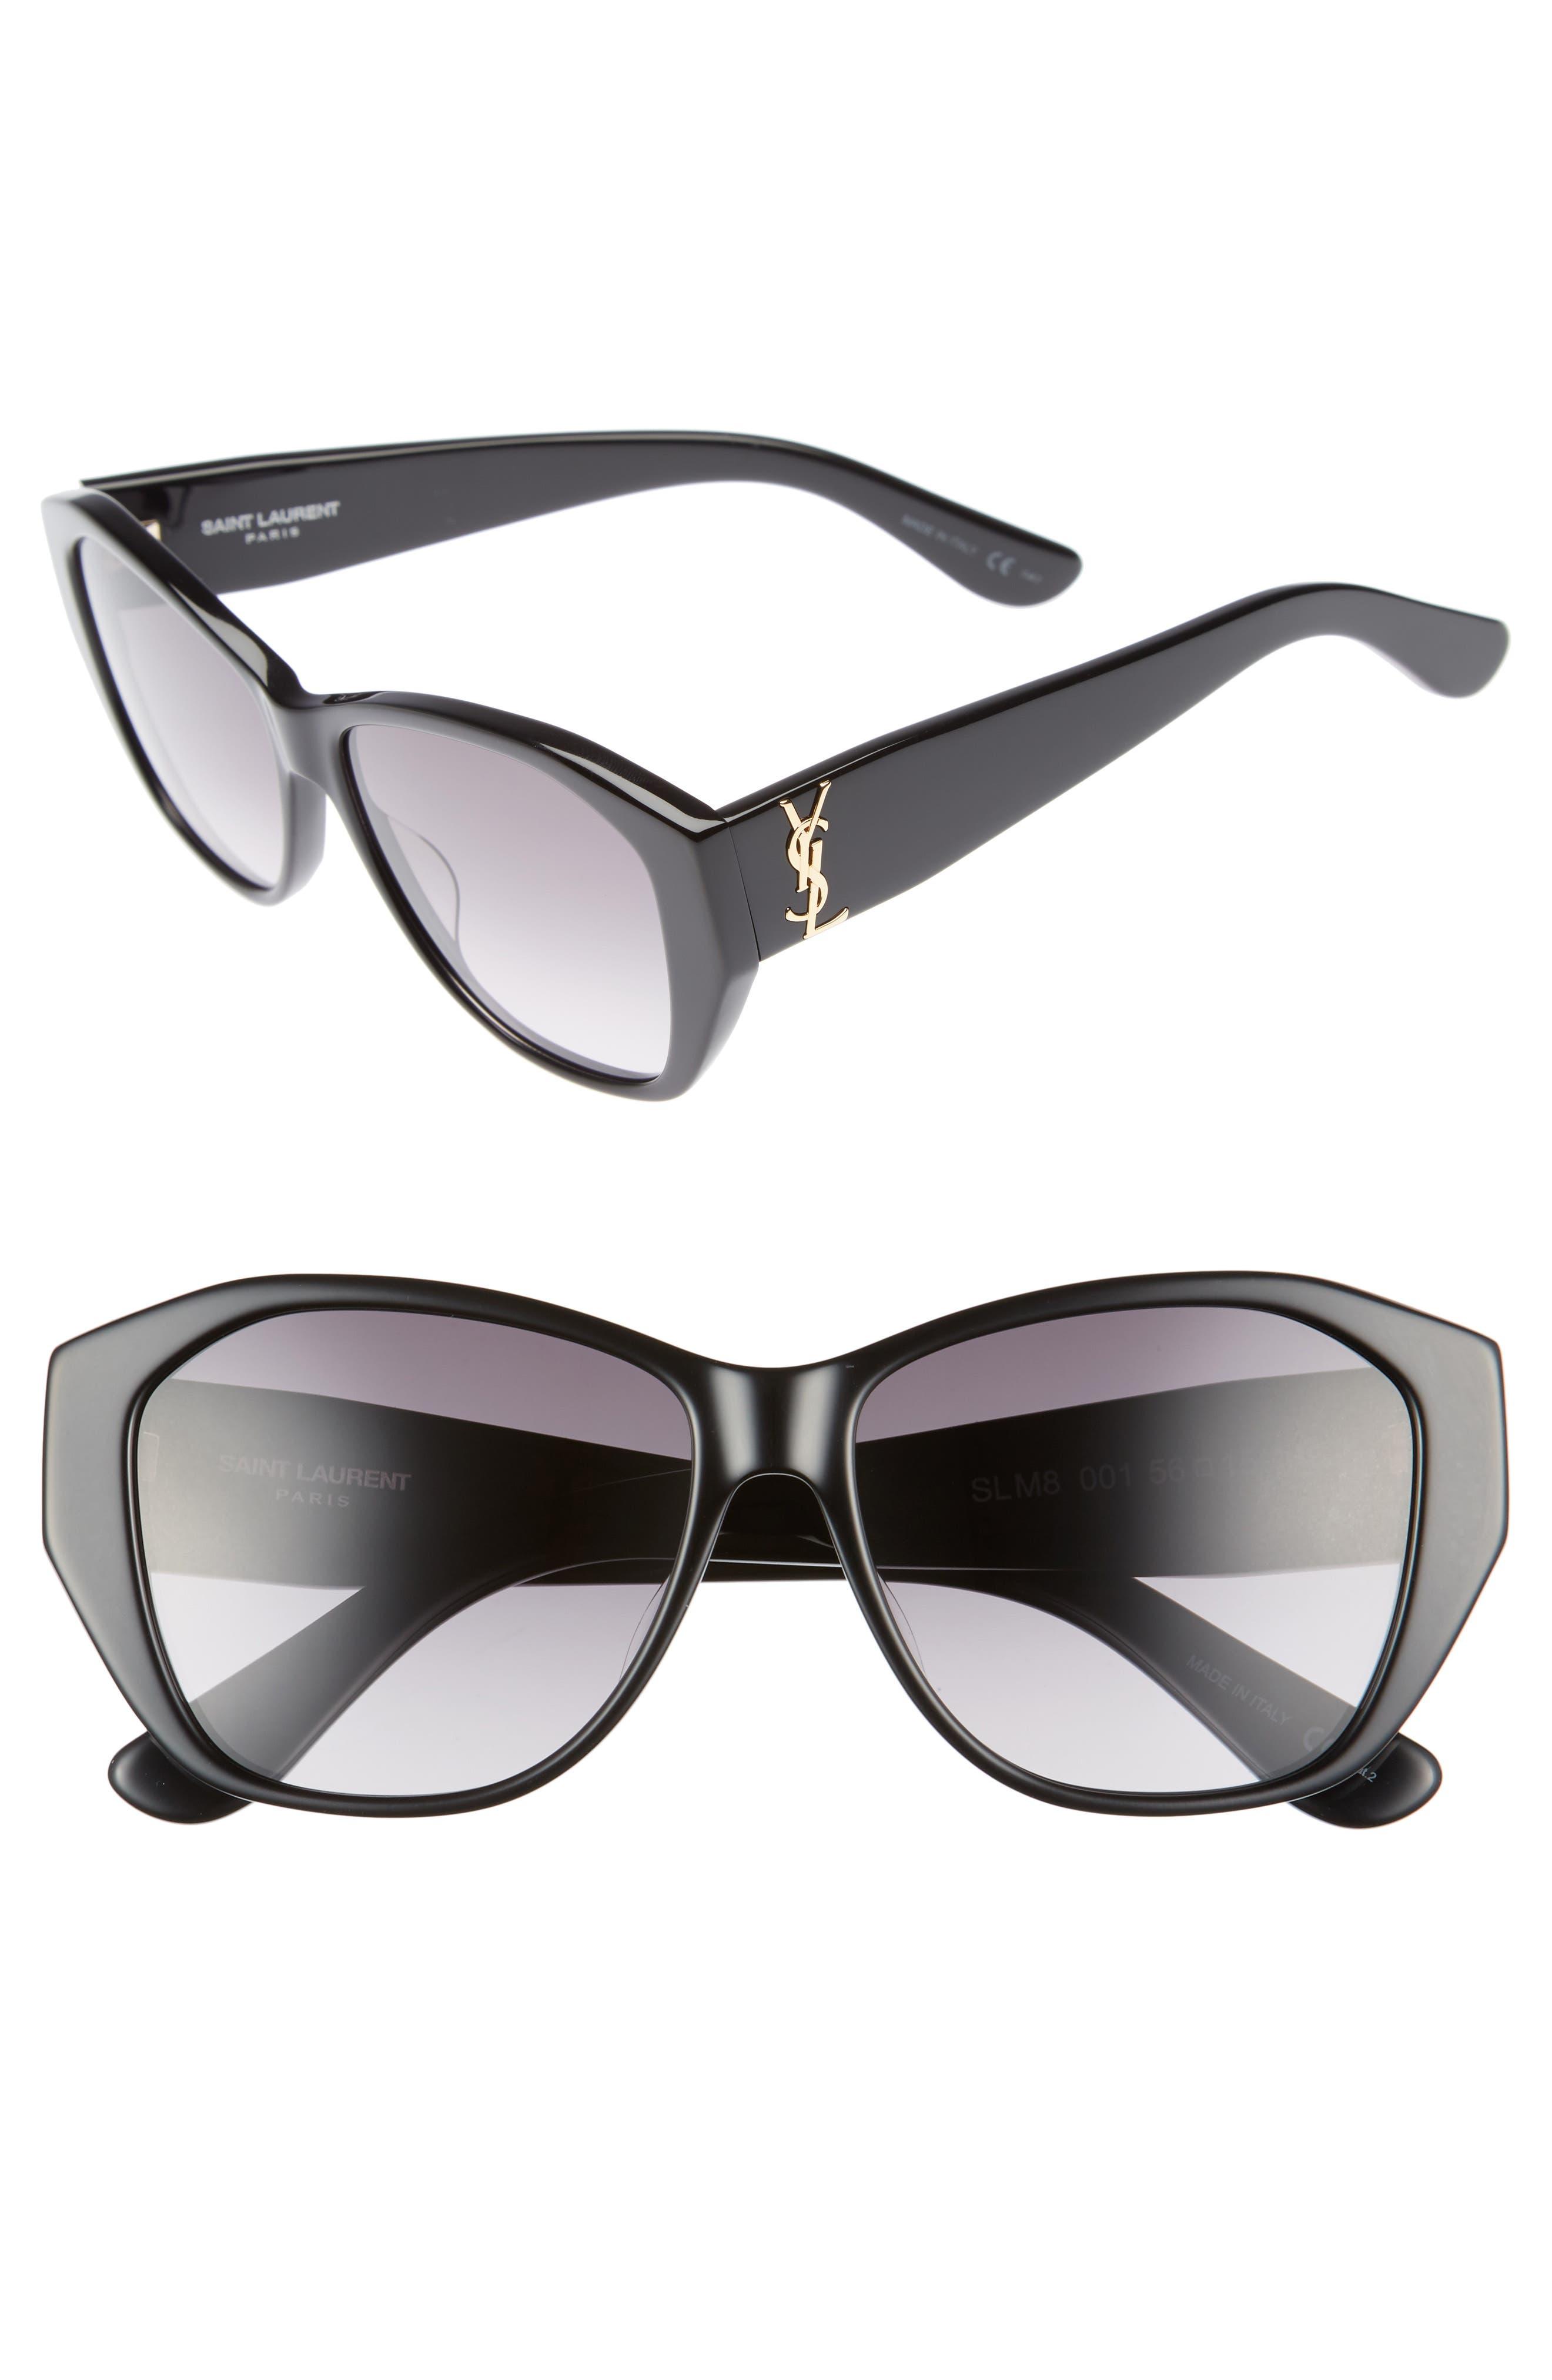 56mm Sunglasses,                             Main thumbnail 1, color,                             Black/ Black/ Grey